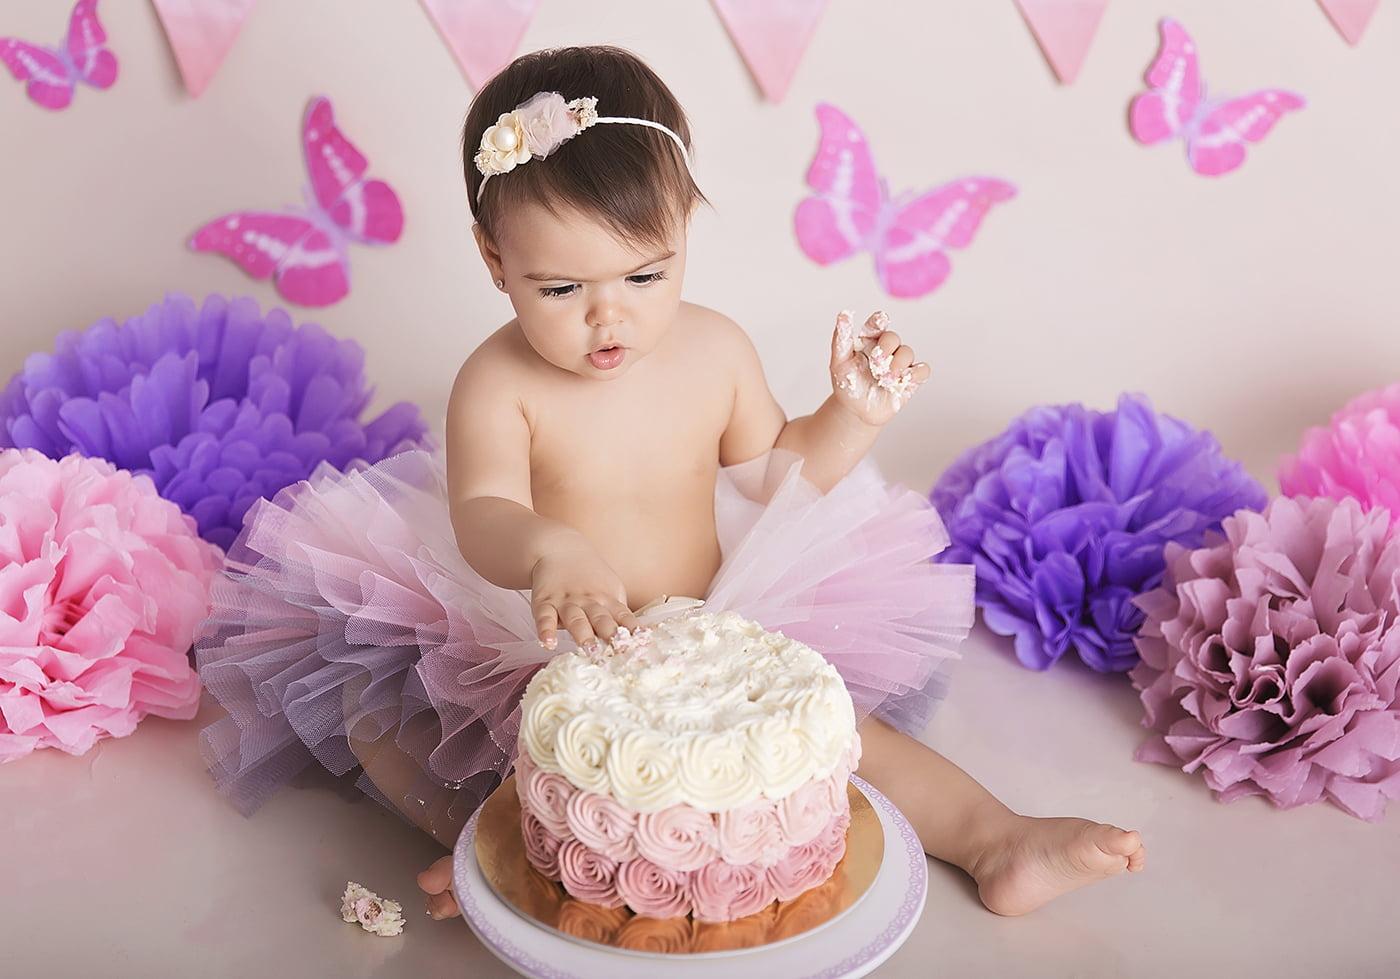 sedinta-foto-1-an-aniversare-cake-smash-fotograf-bebe-bucuresti-mvphotography-amalia- (11)